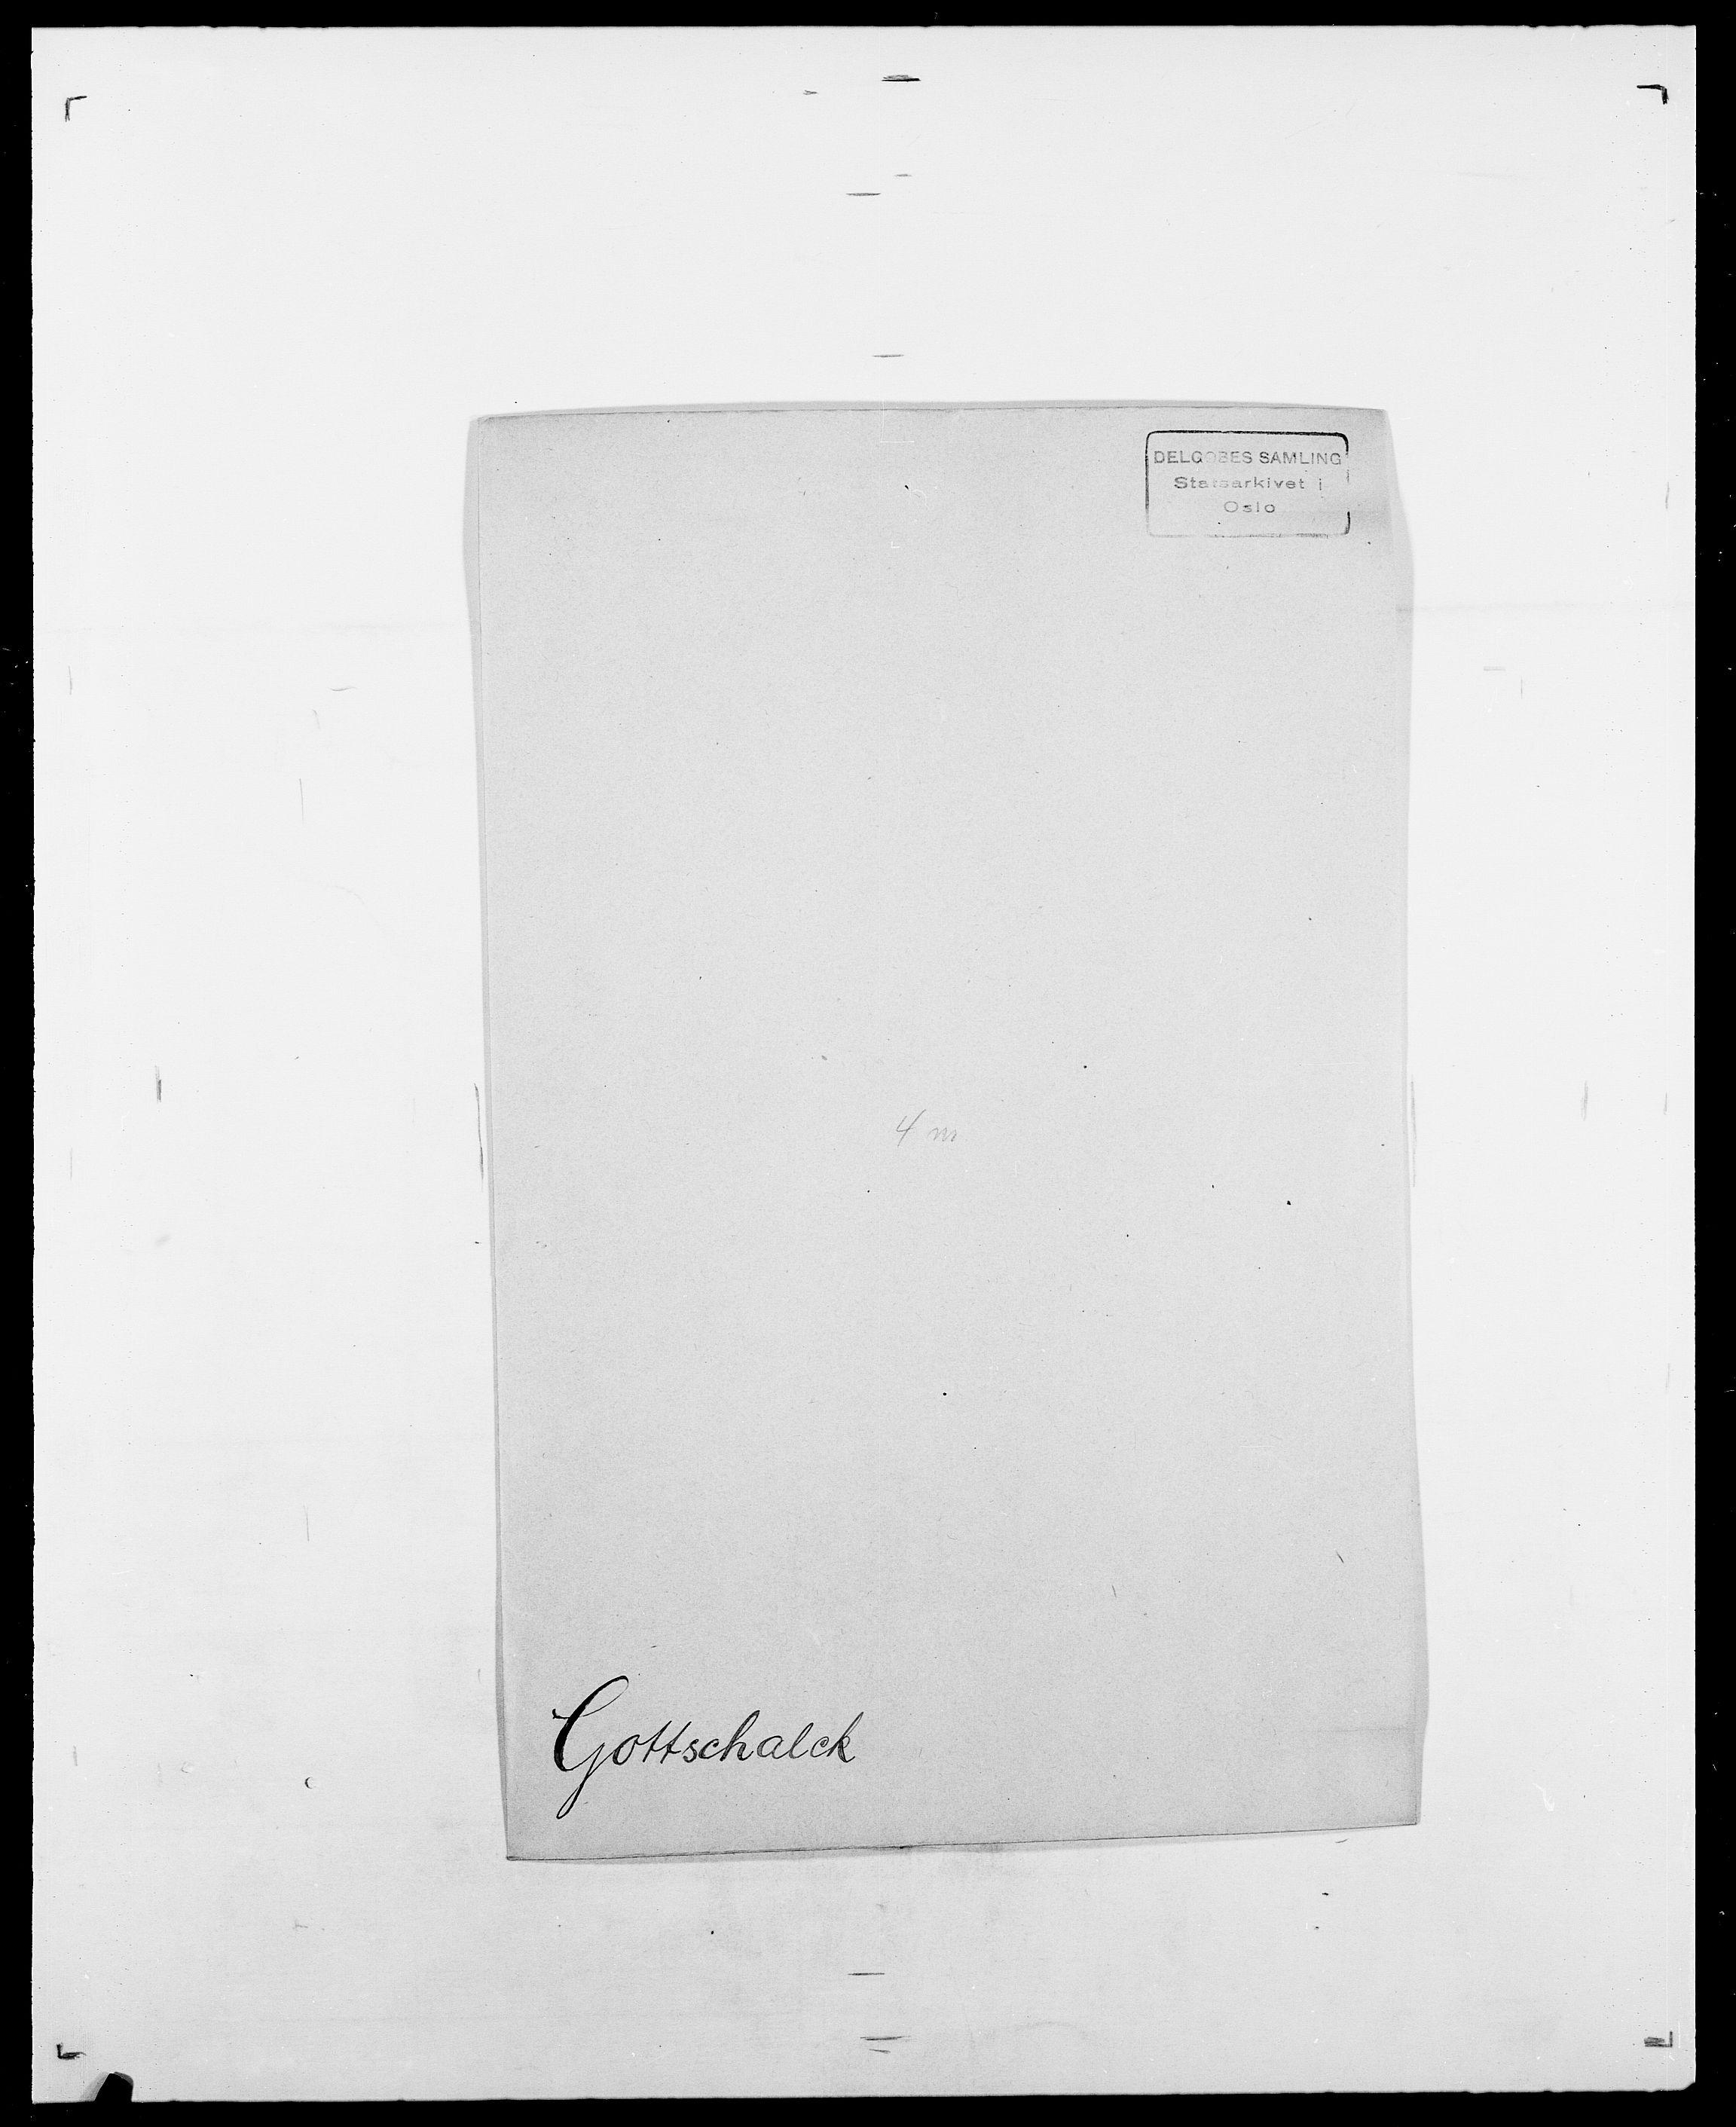 SAO, Delgobe, Charles Antoine - samling, D/Da/L0014: Giebdhausen - Grip, s. 403